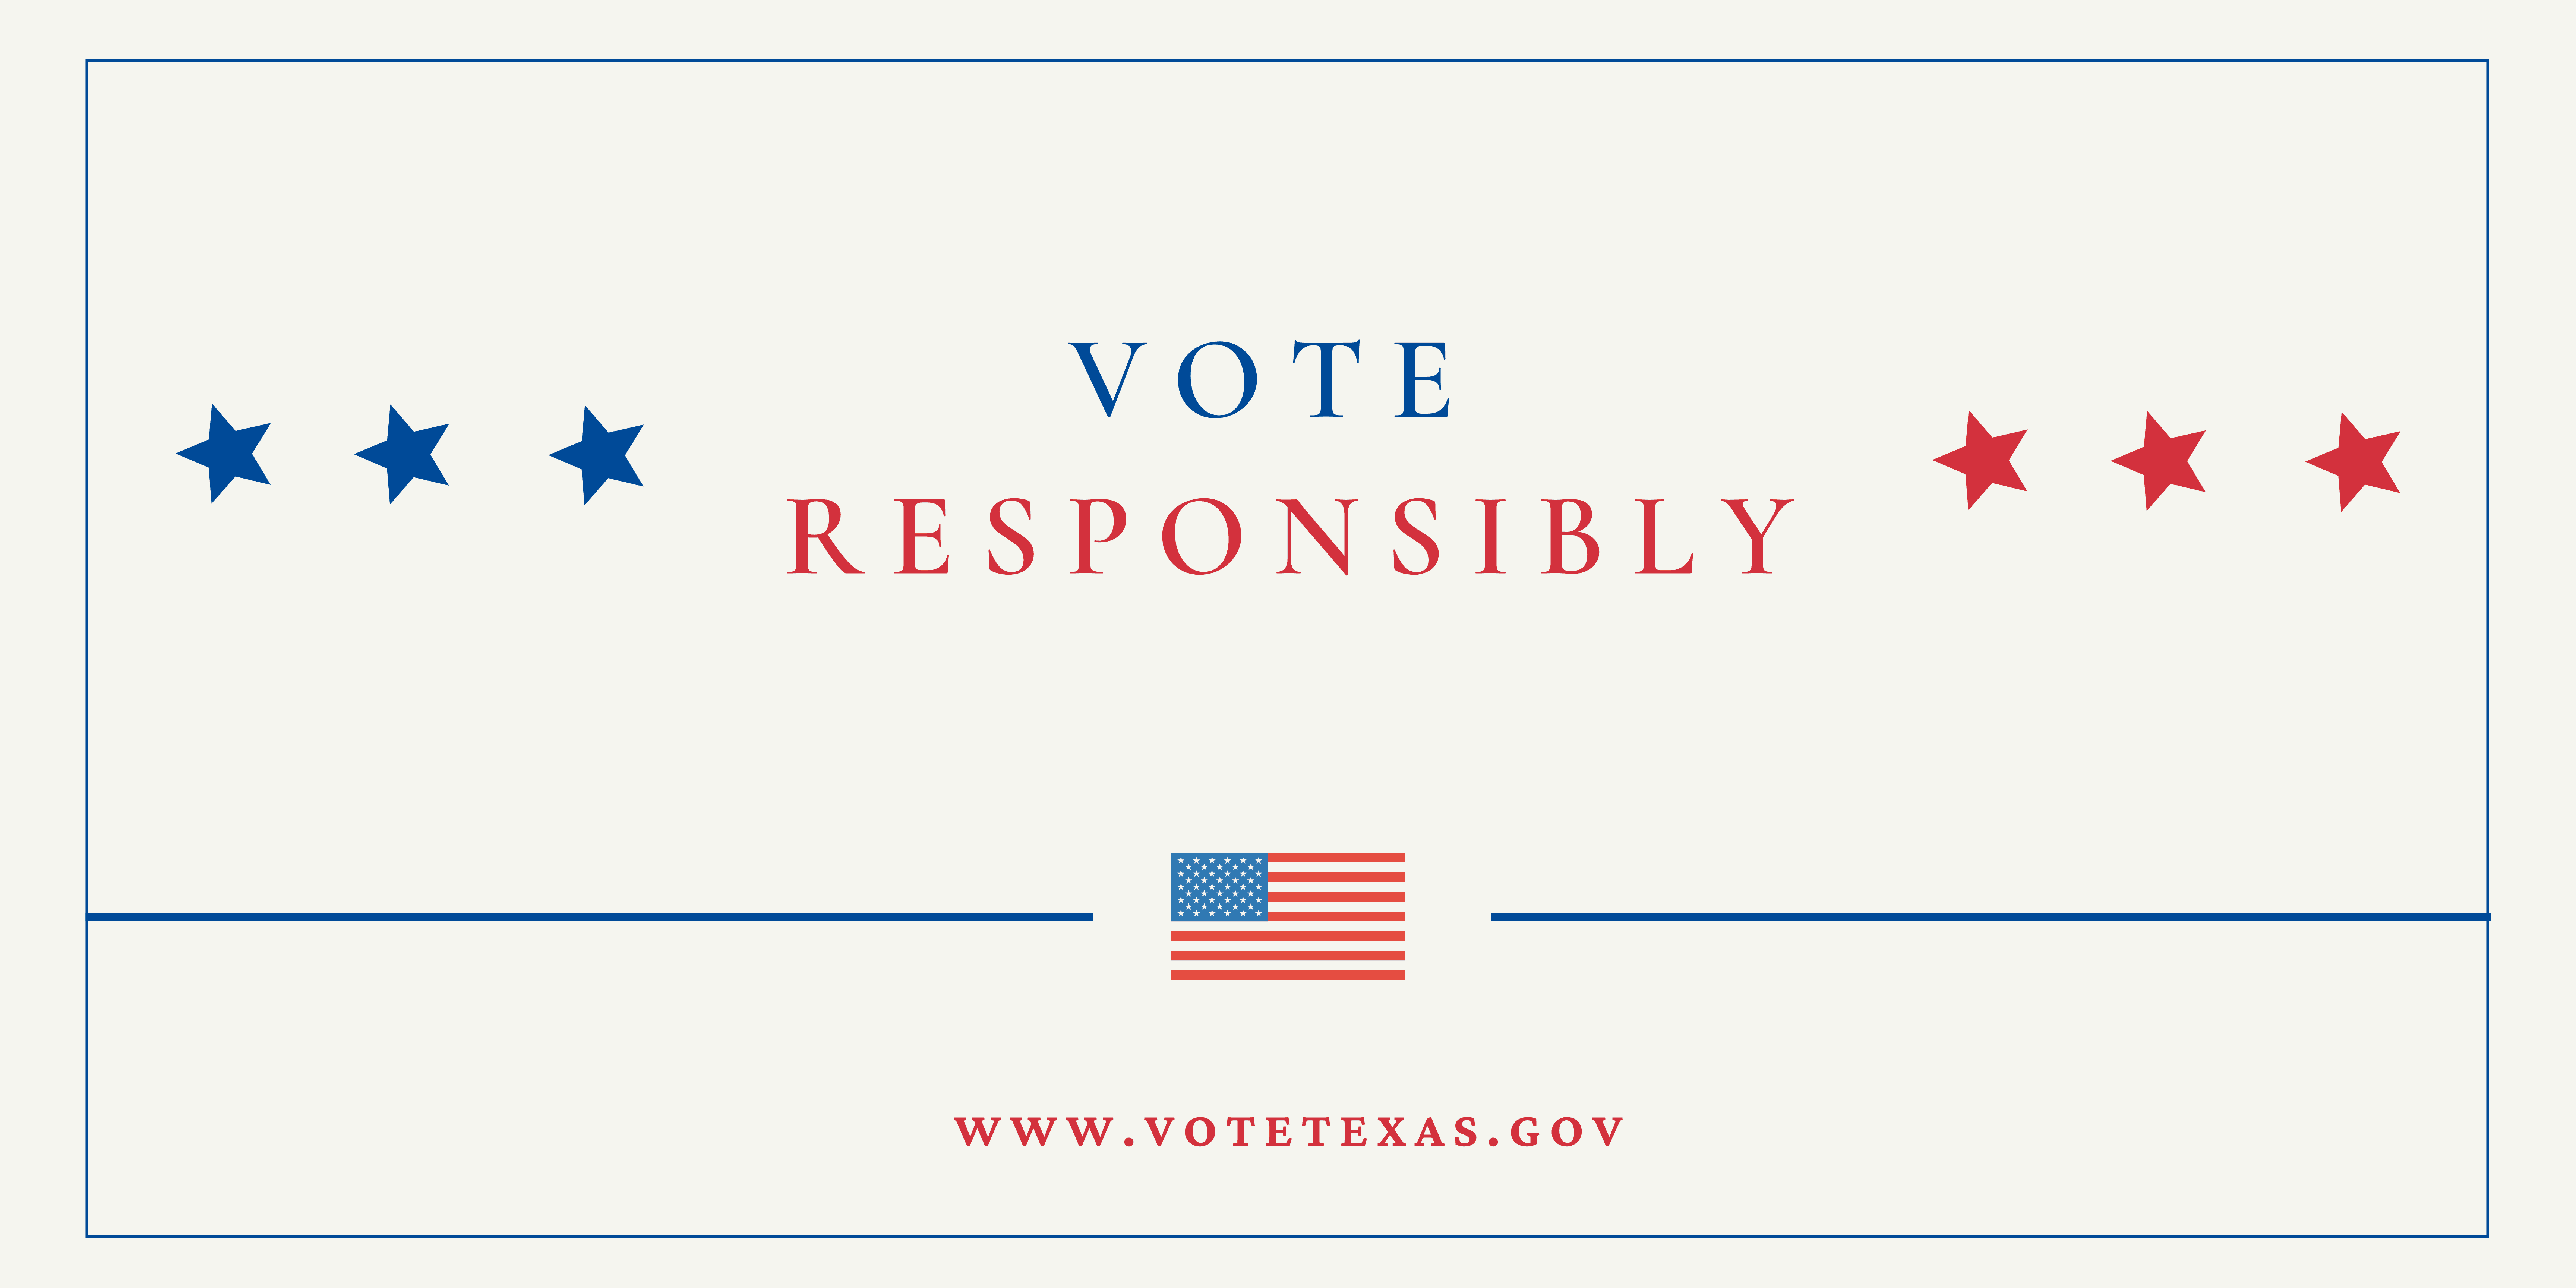 Vote Responsibly Banner